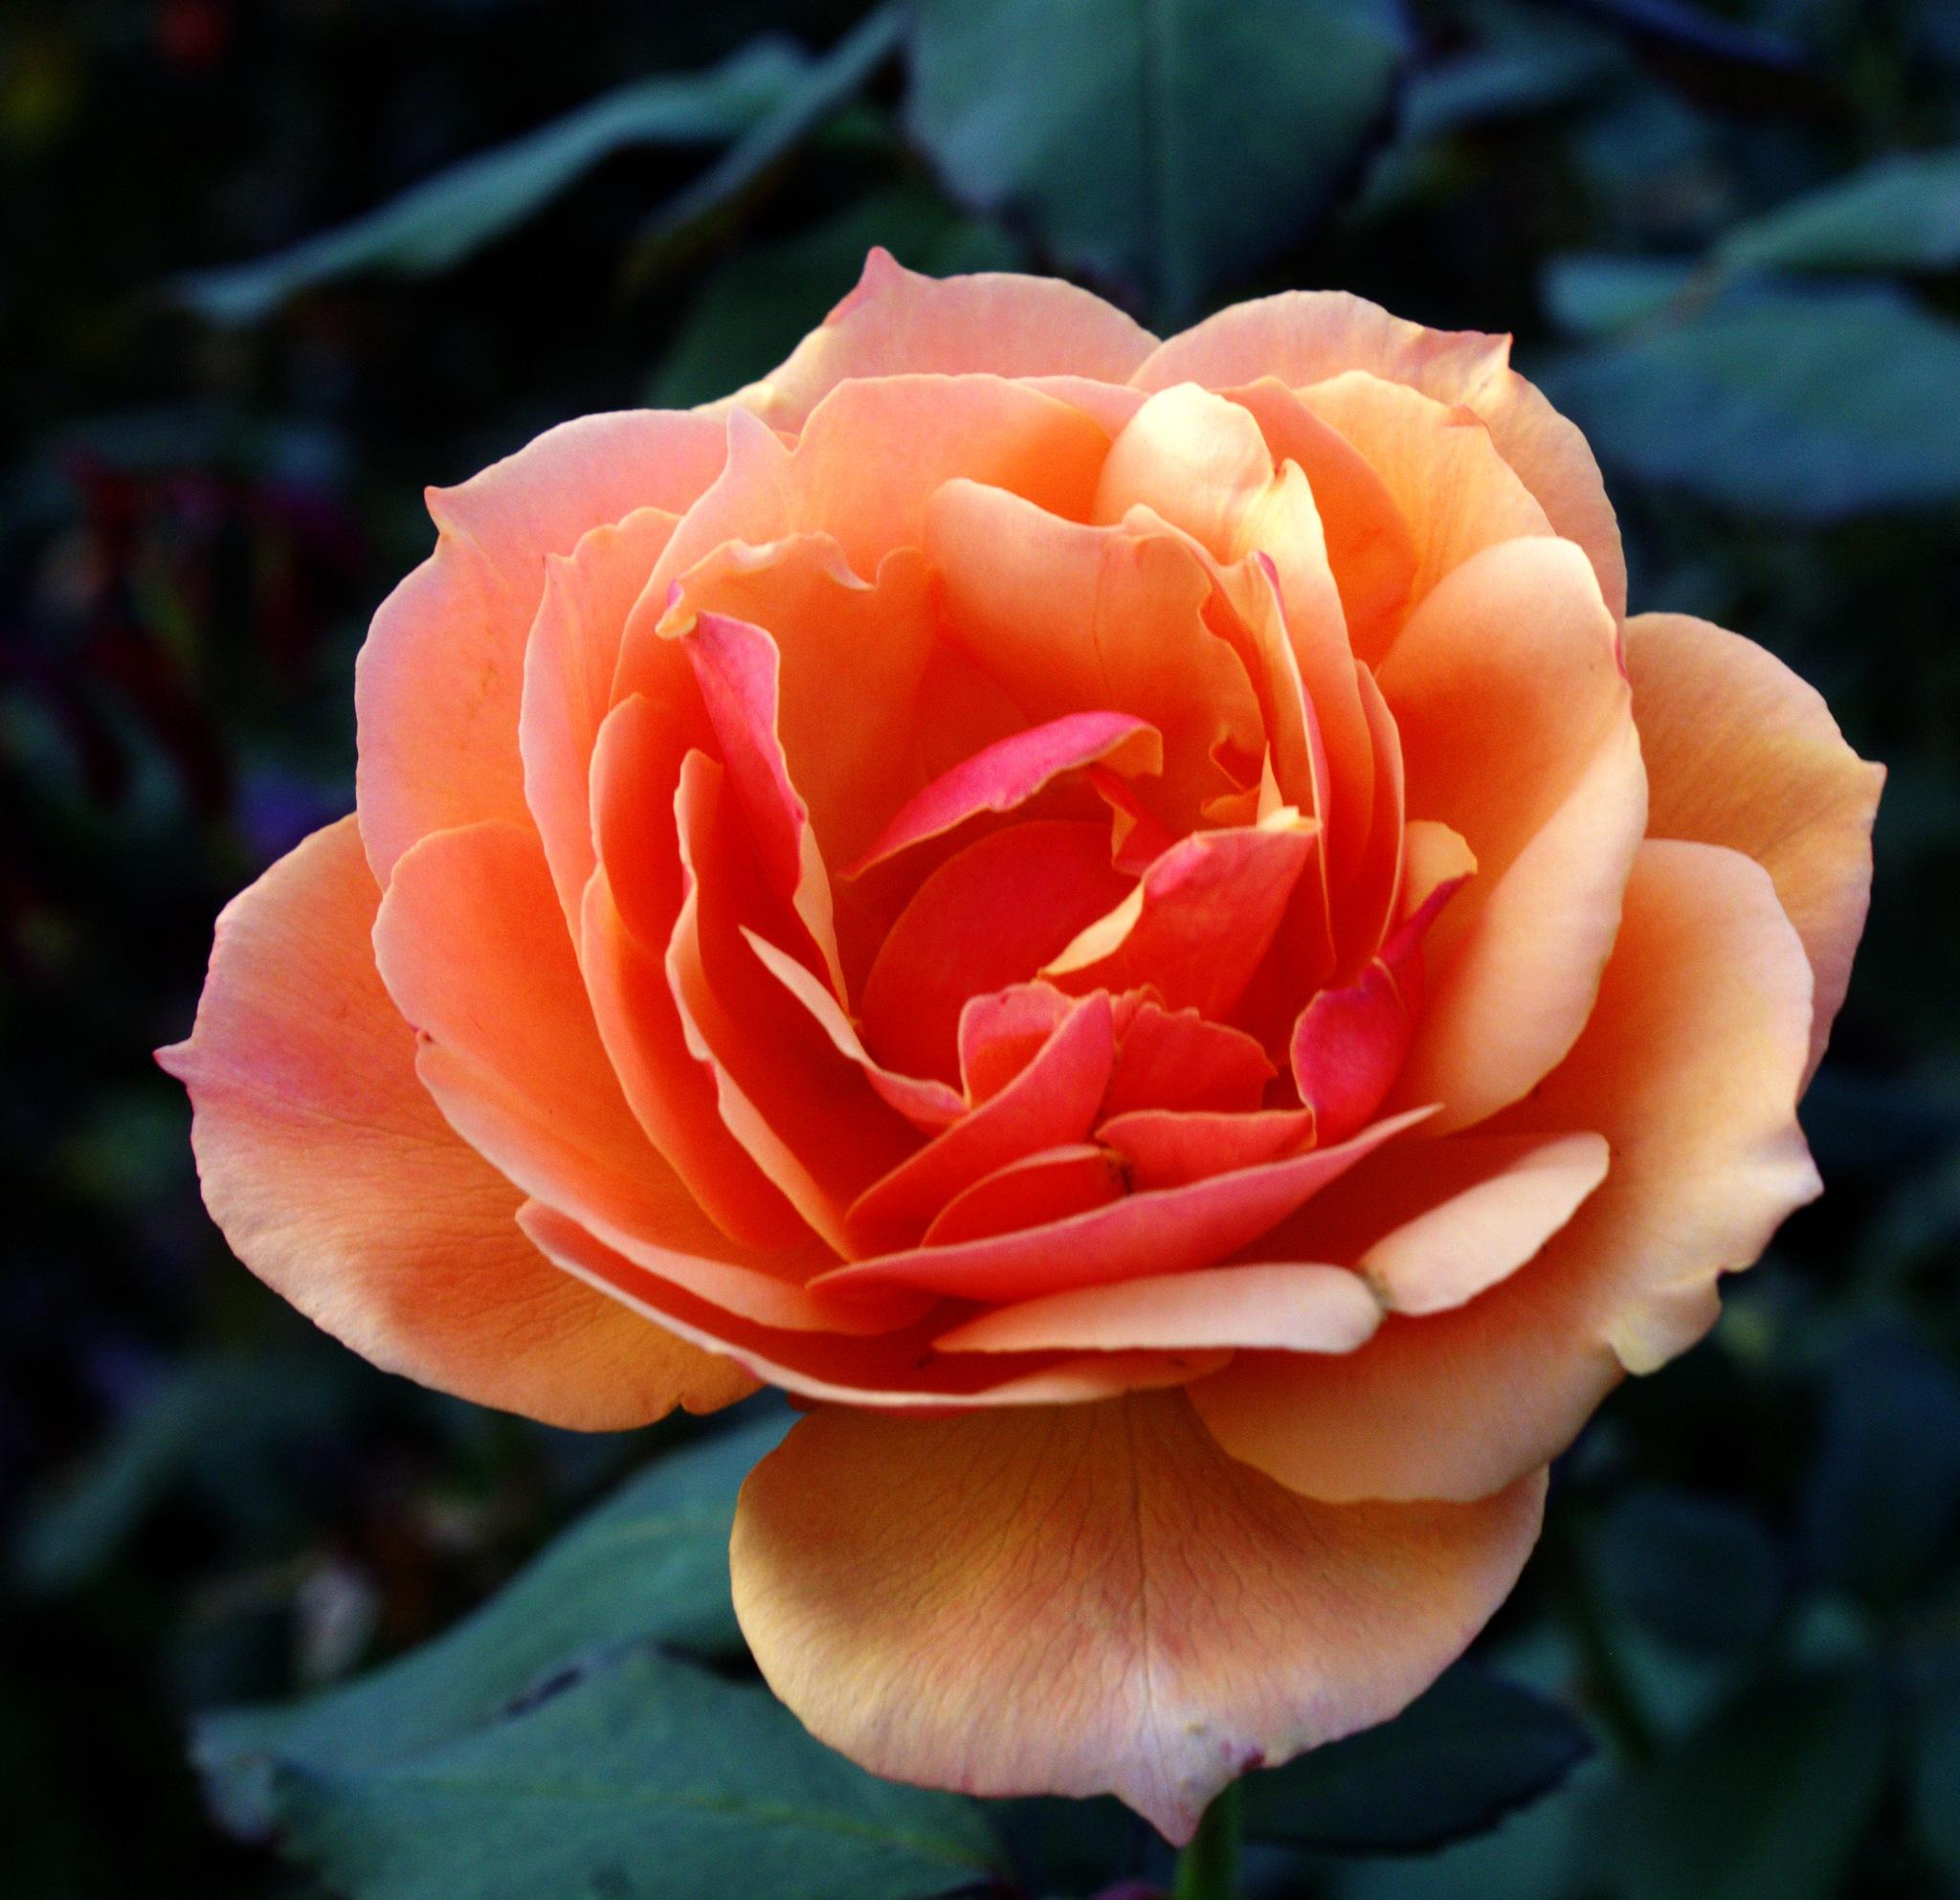 PEACH ROSE 2 by jdwines